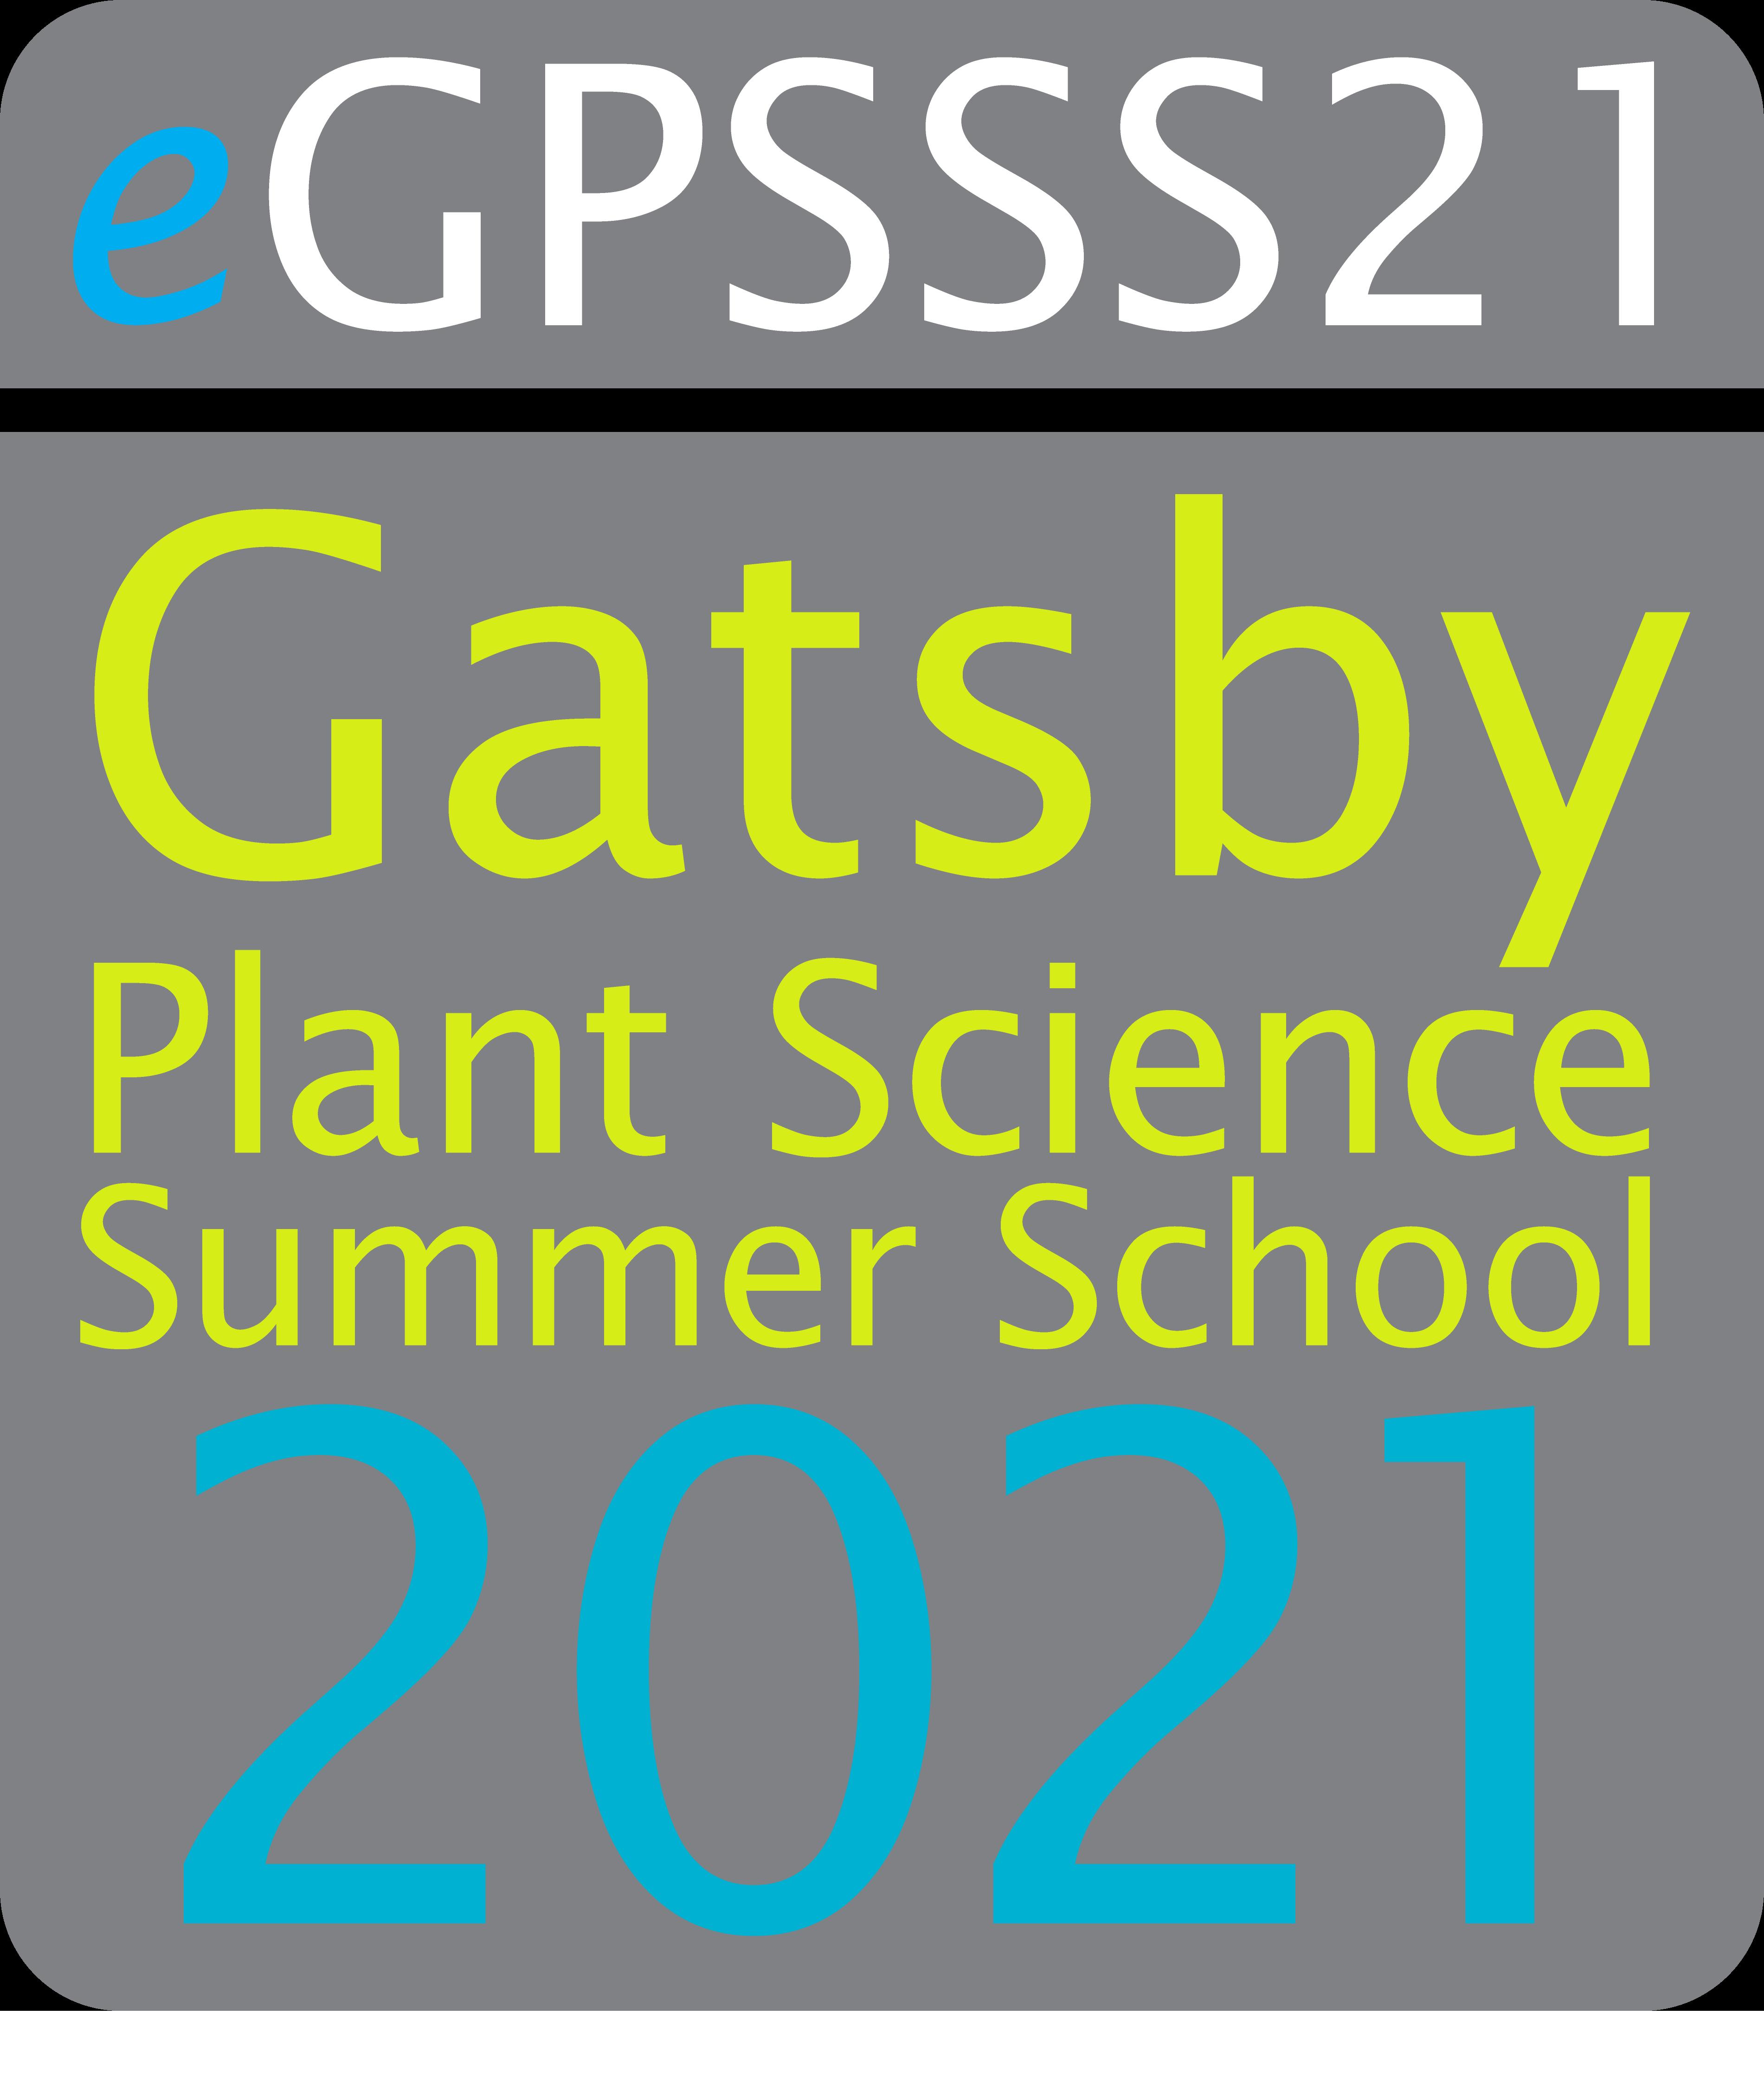 Gatsby Plant Science Summer School 2021 logo